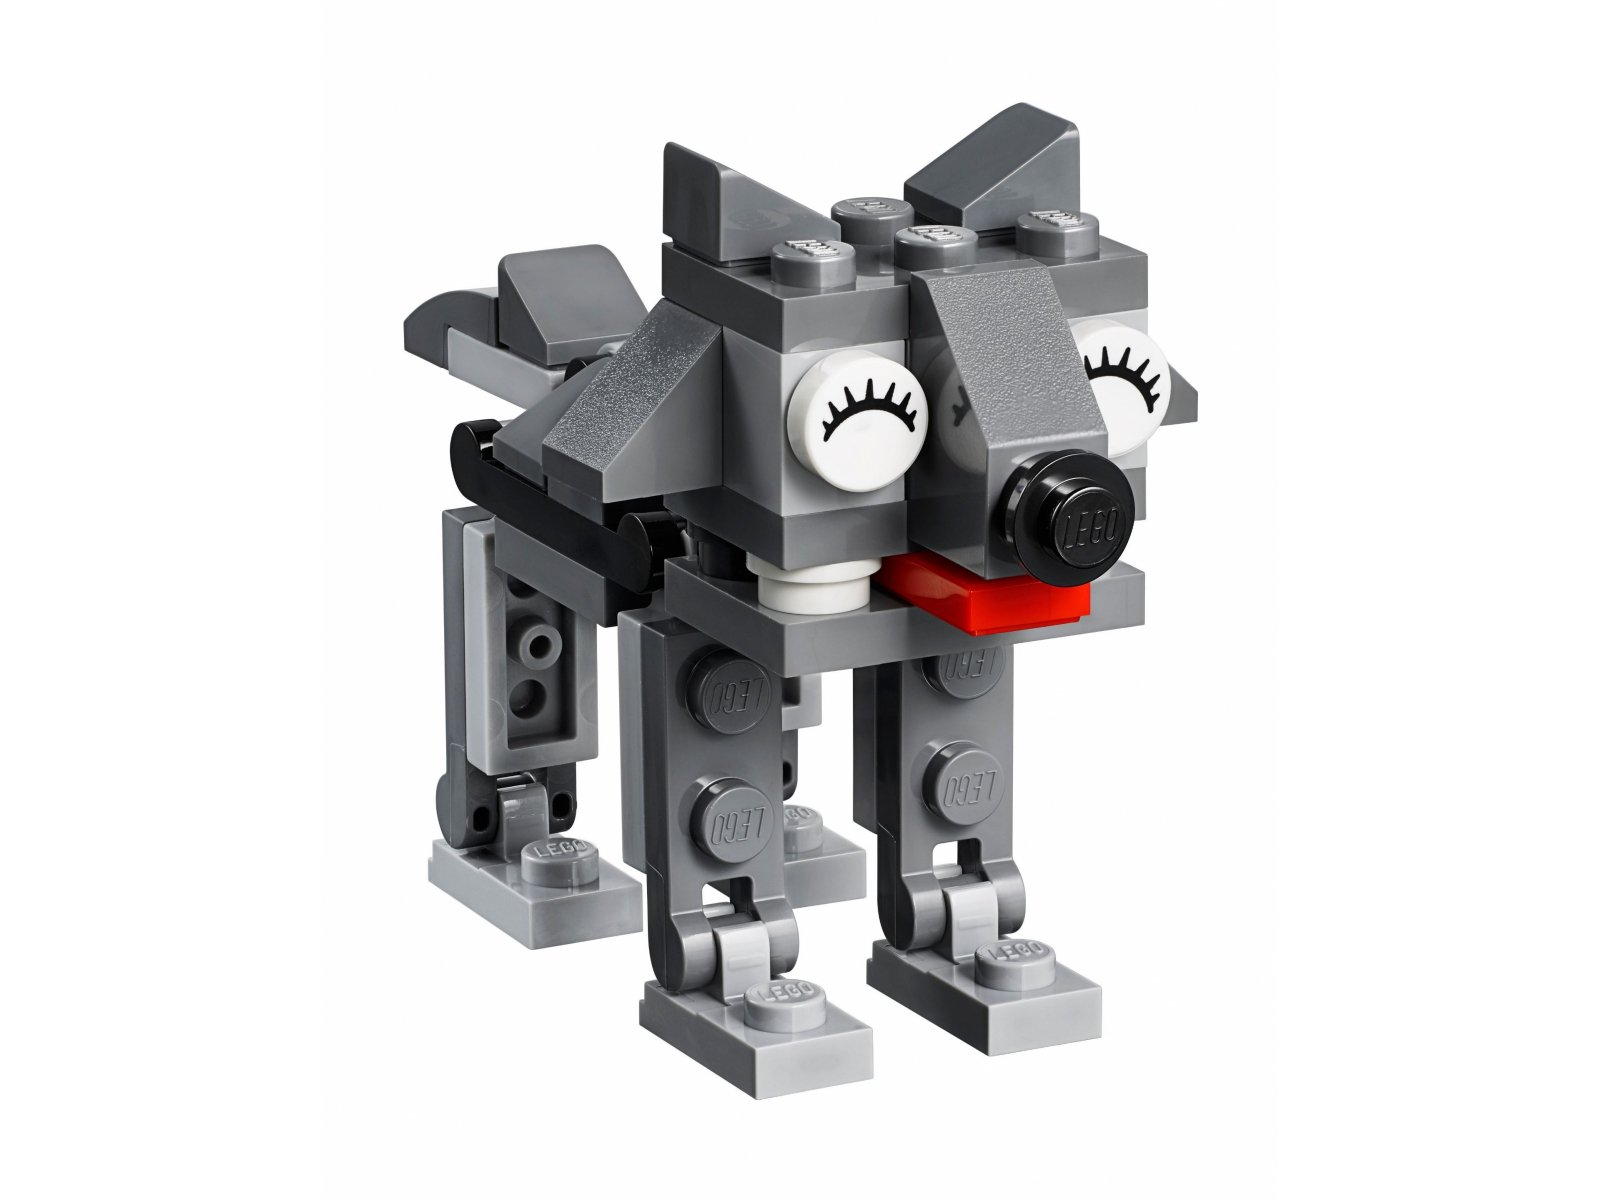 LEGO Wilk 40331